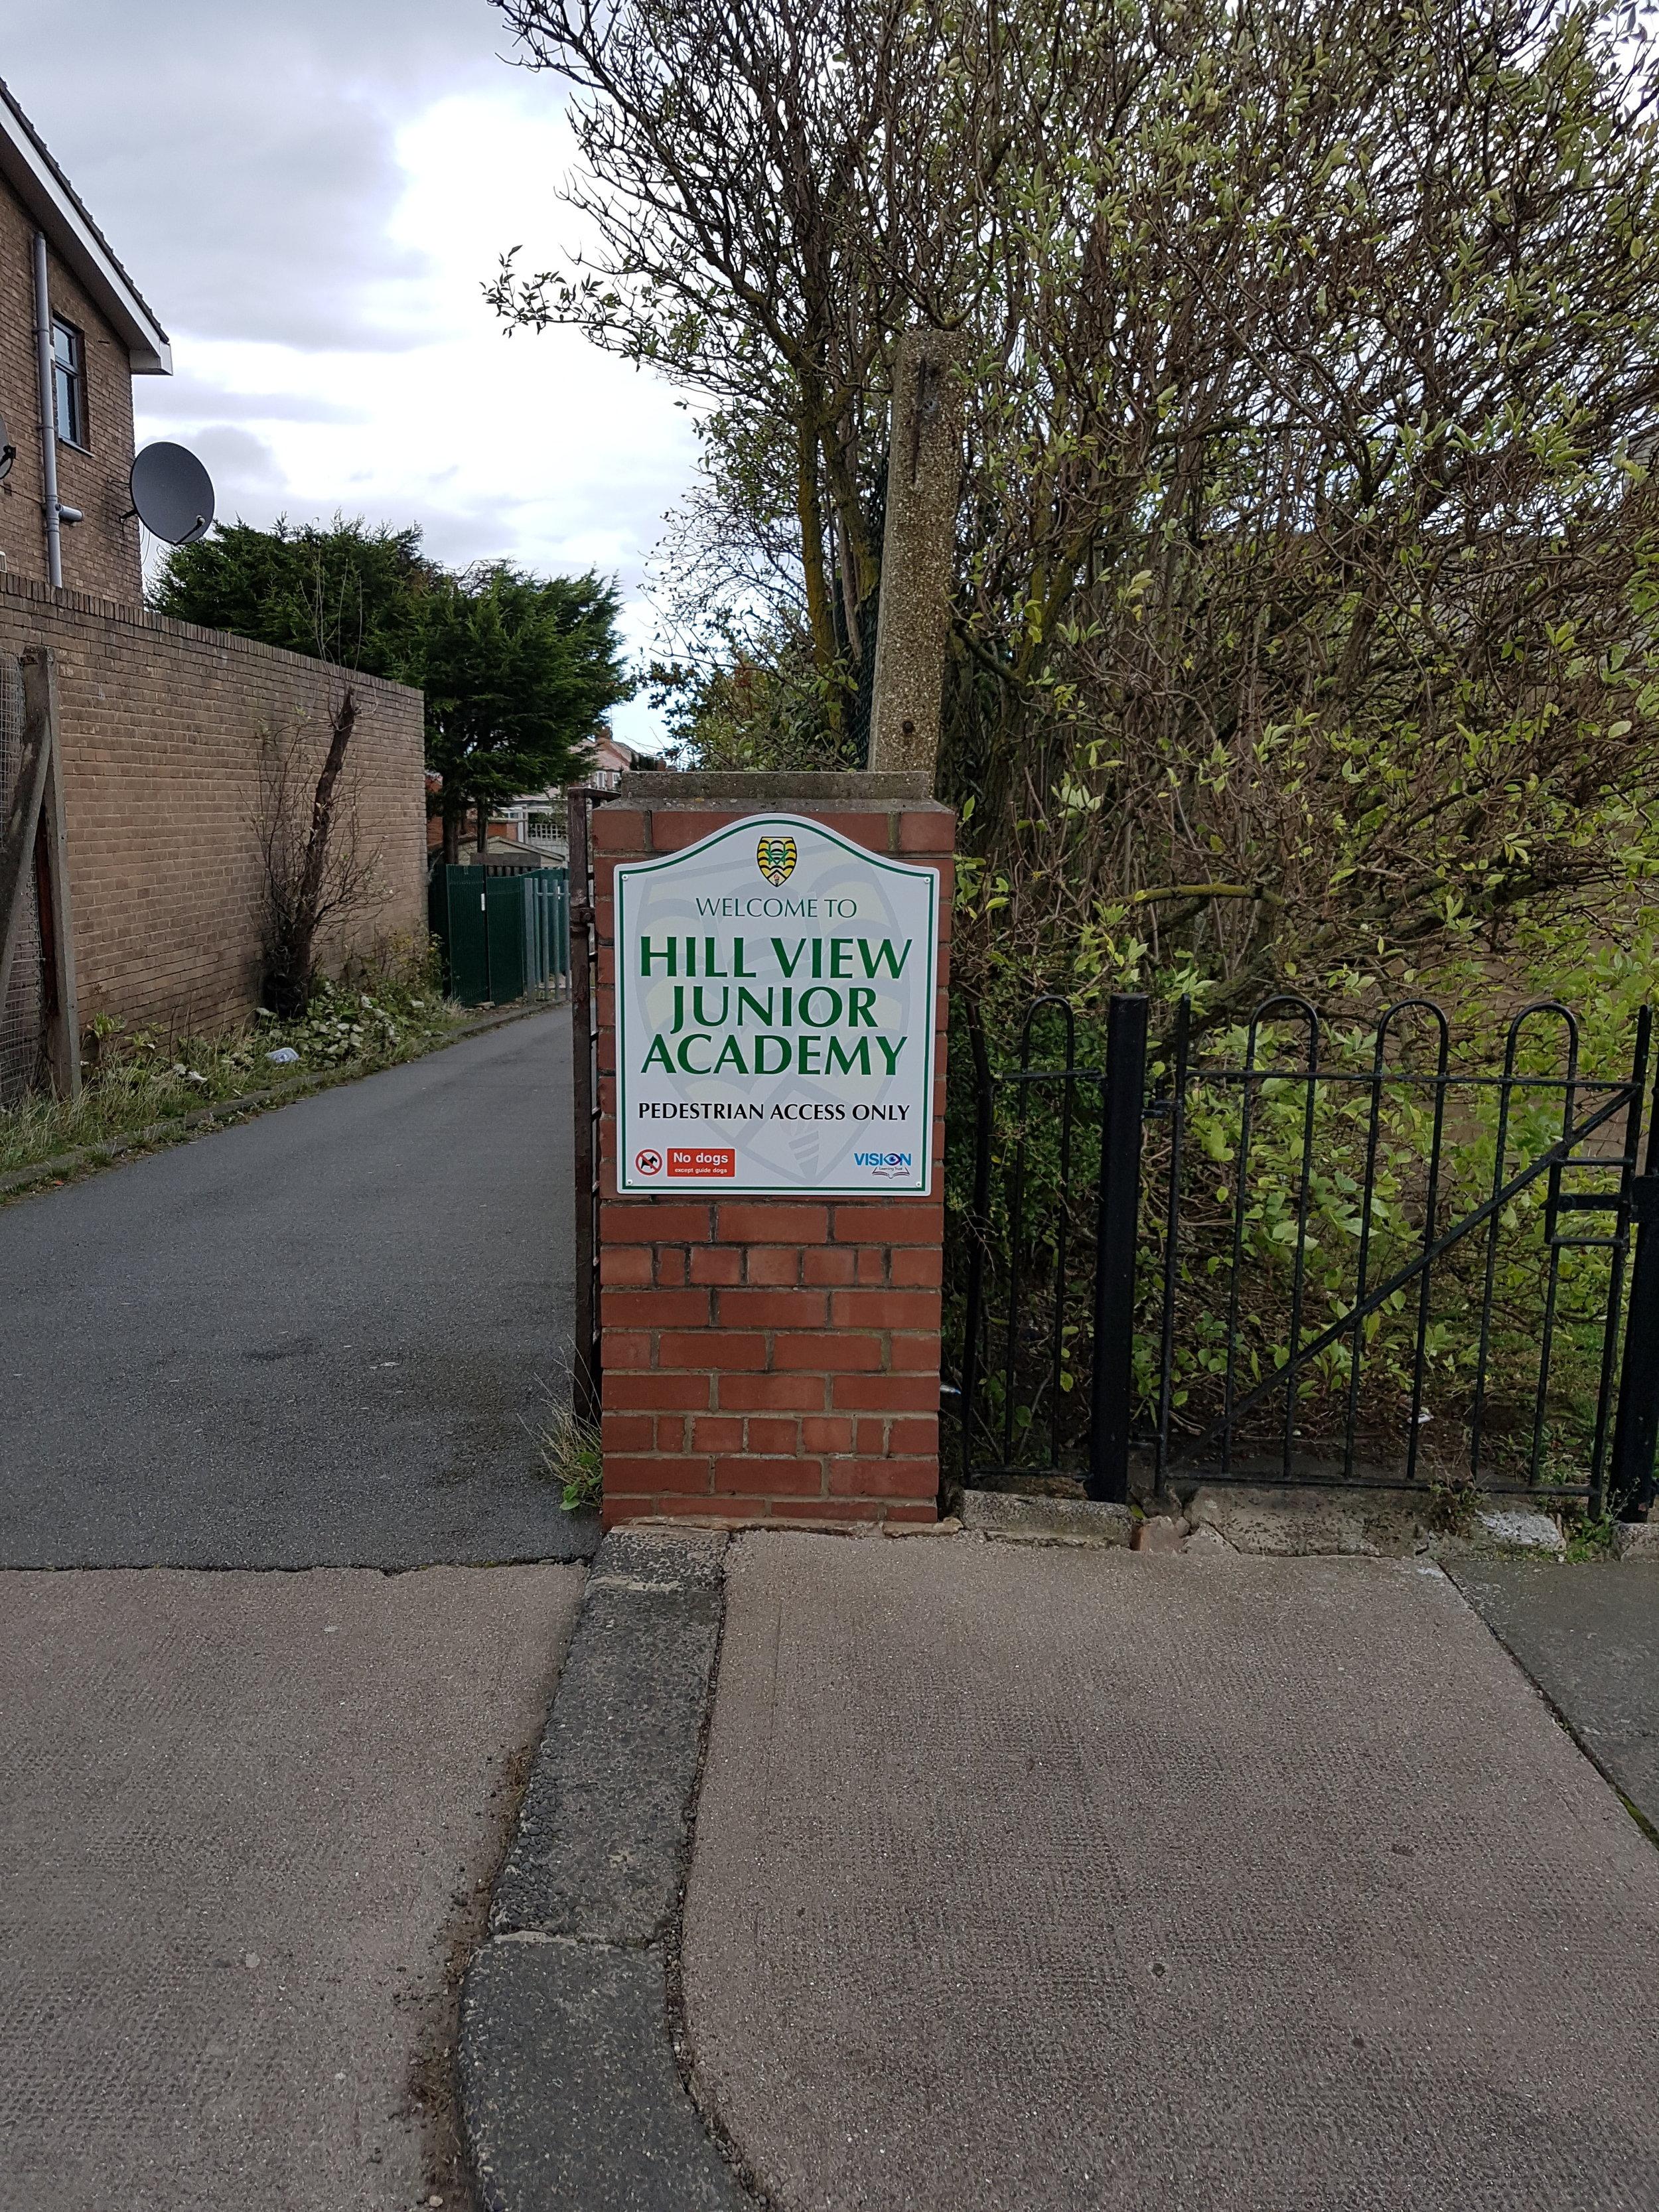 Hill View Brick Pillar Mounted Sign